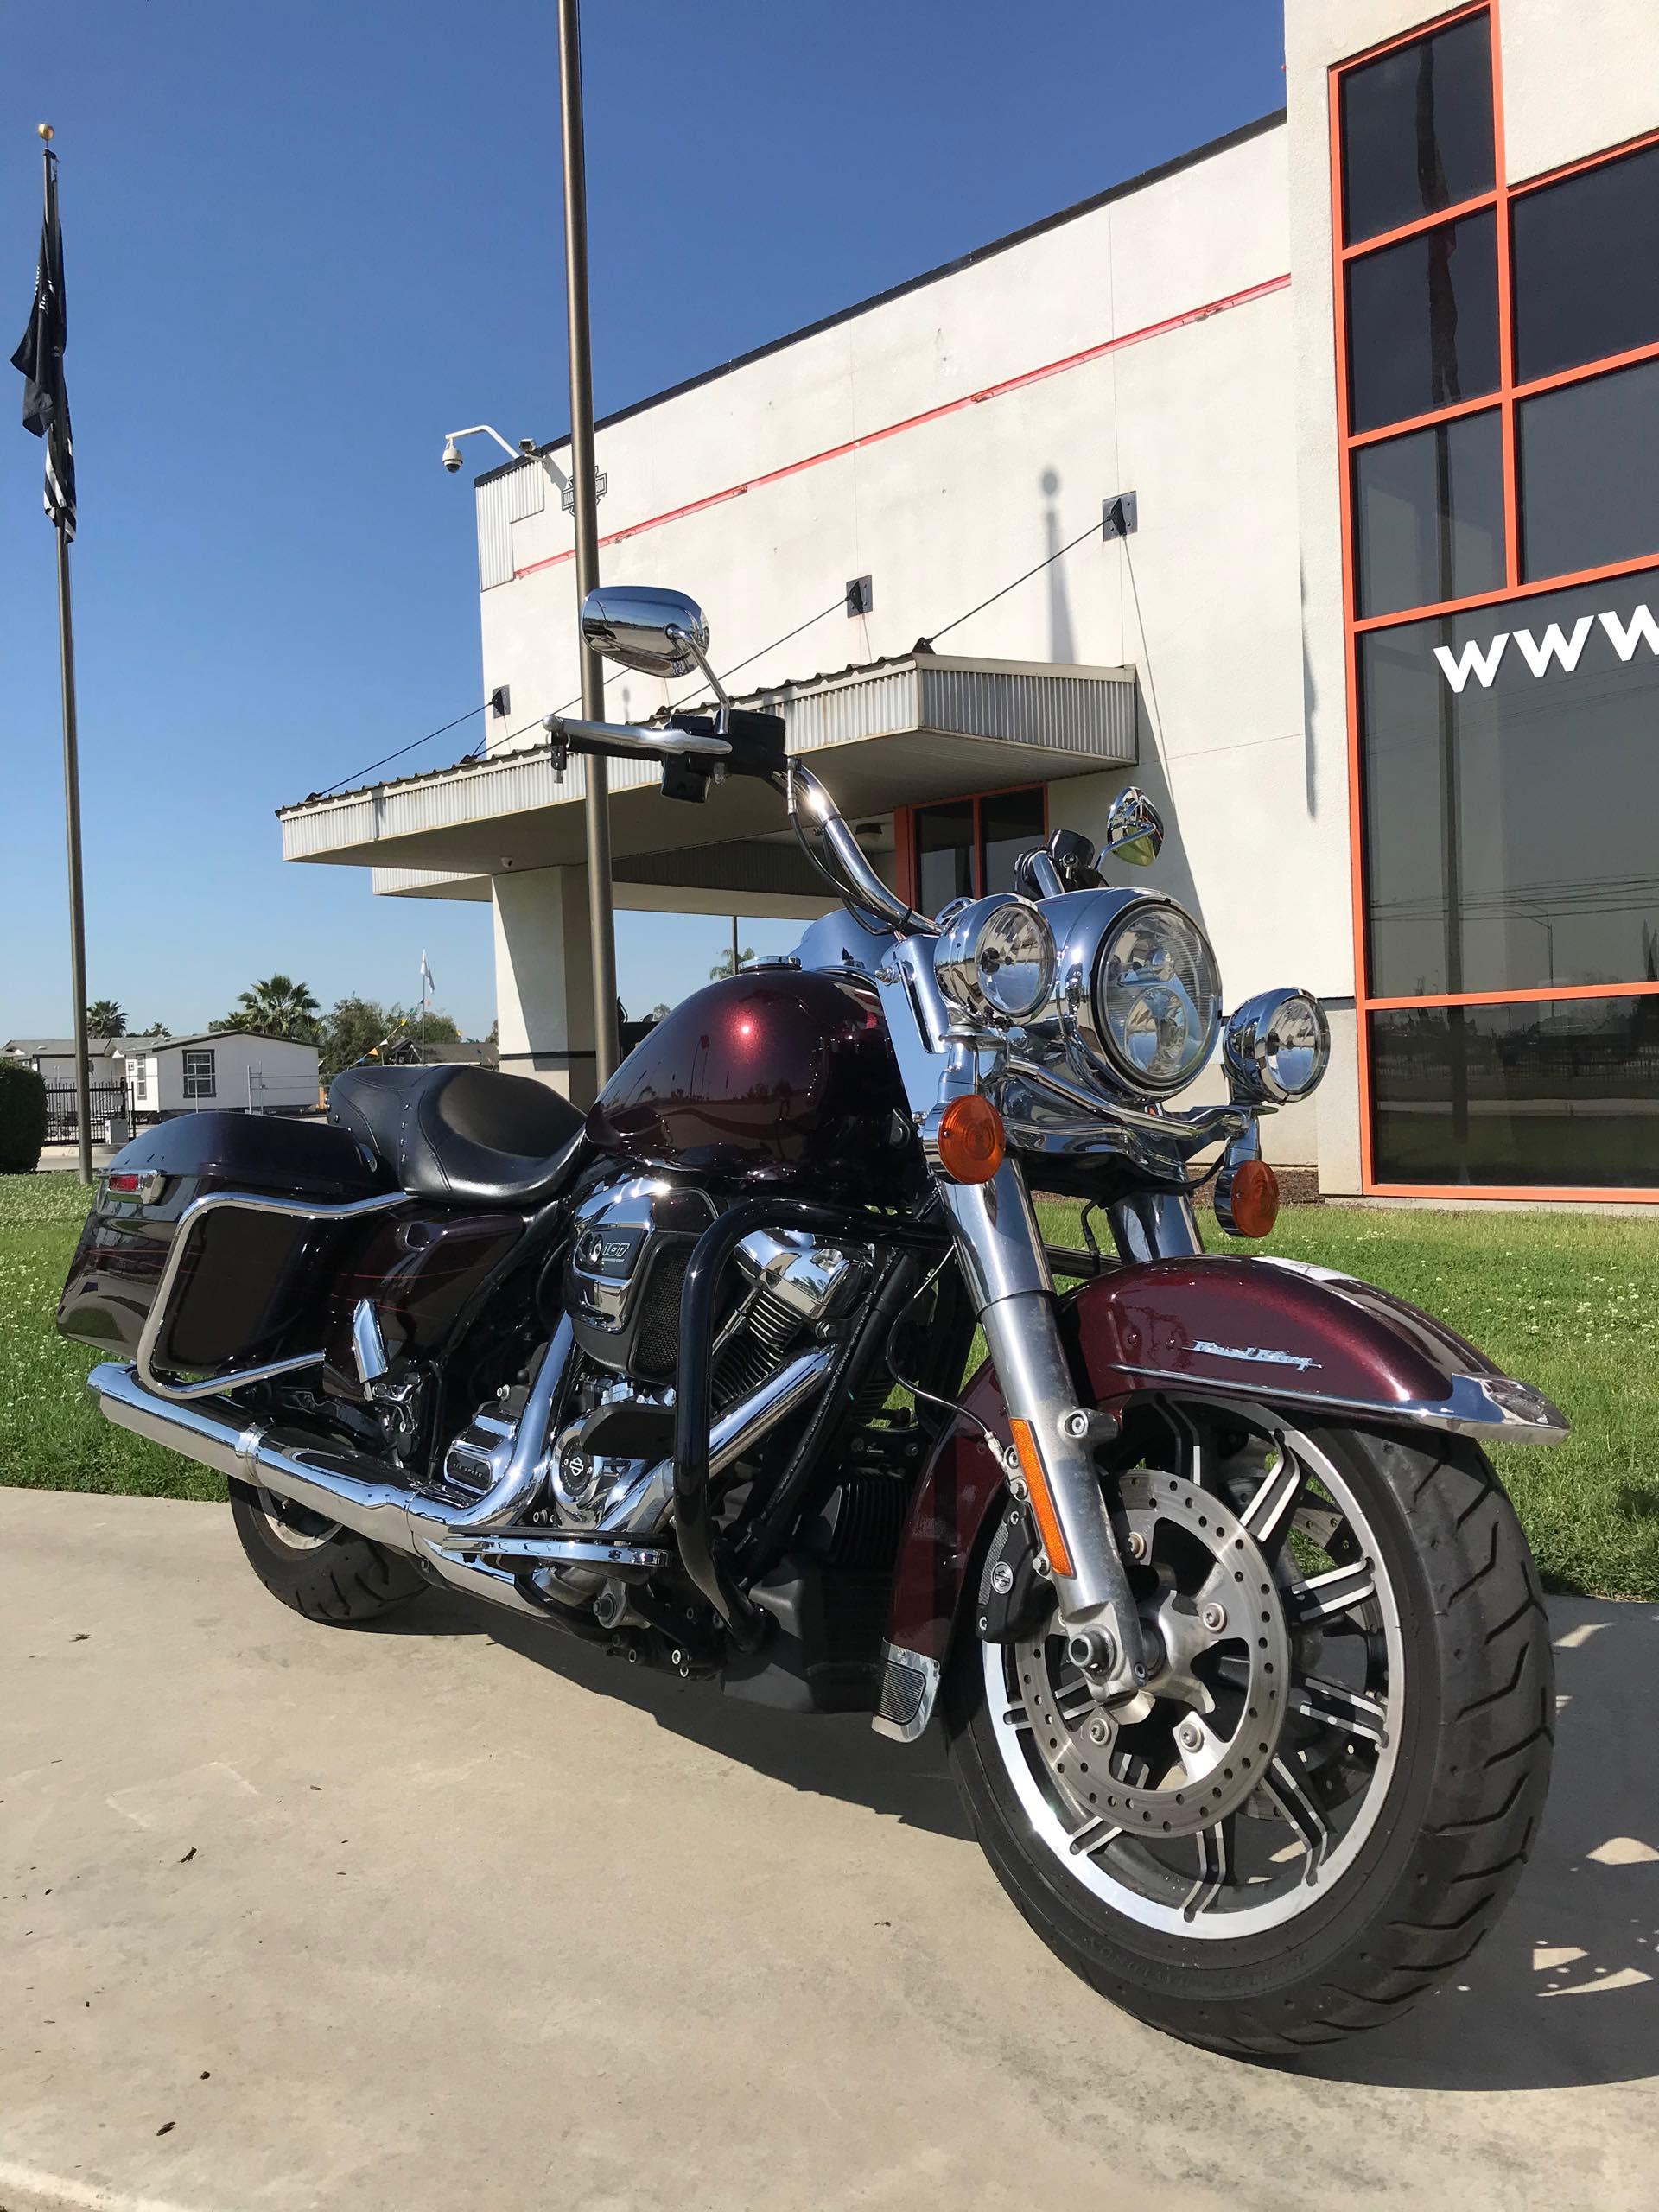 2018 Harley-Davidson Road King Base at Visalia Harley-Davidson